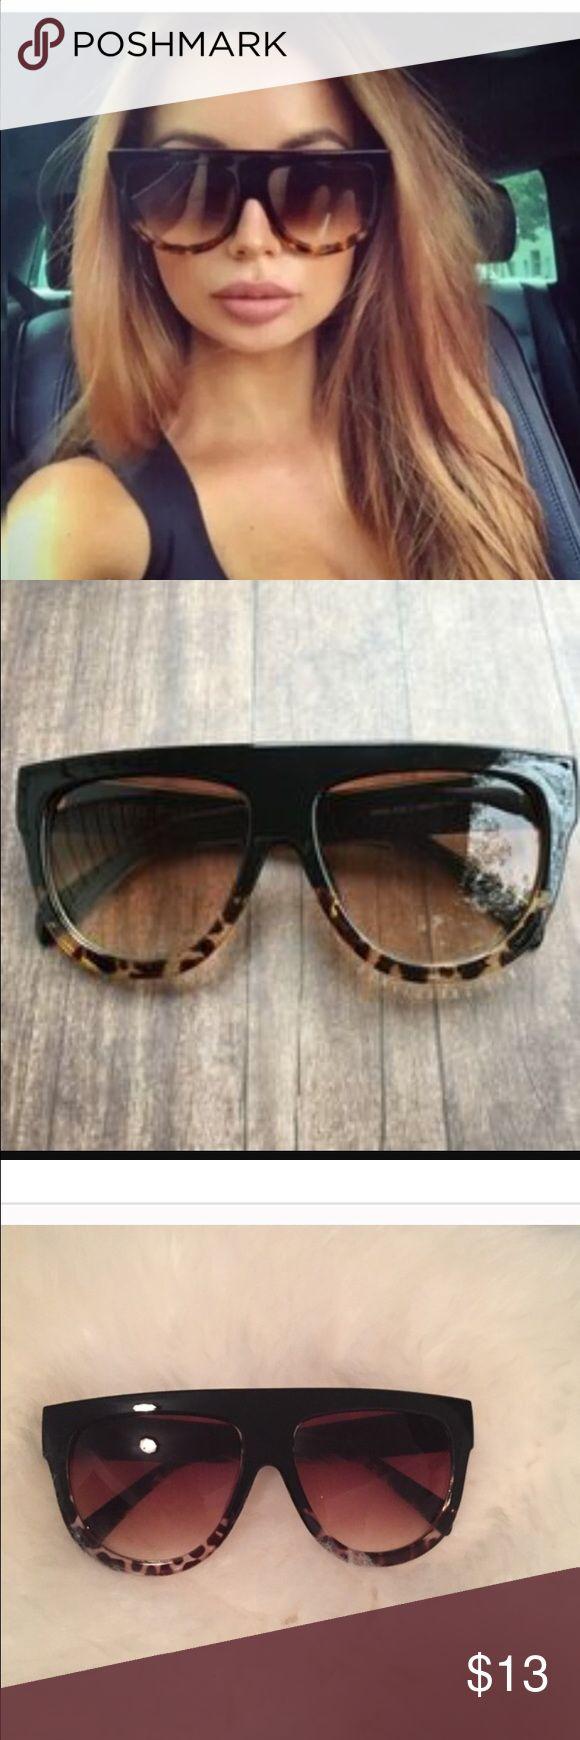 Oversized flat top vintage sunglasses. Black/leopa Fashion trend. Flat top sunglasses 😎 Accessories Glasses